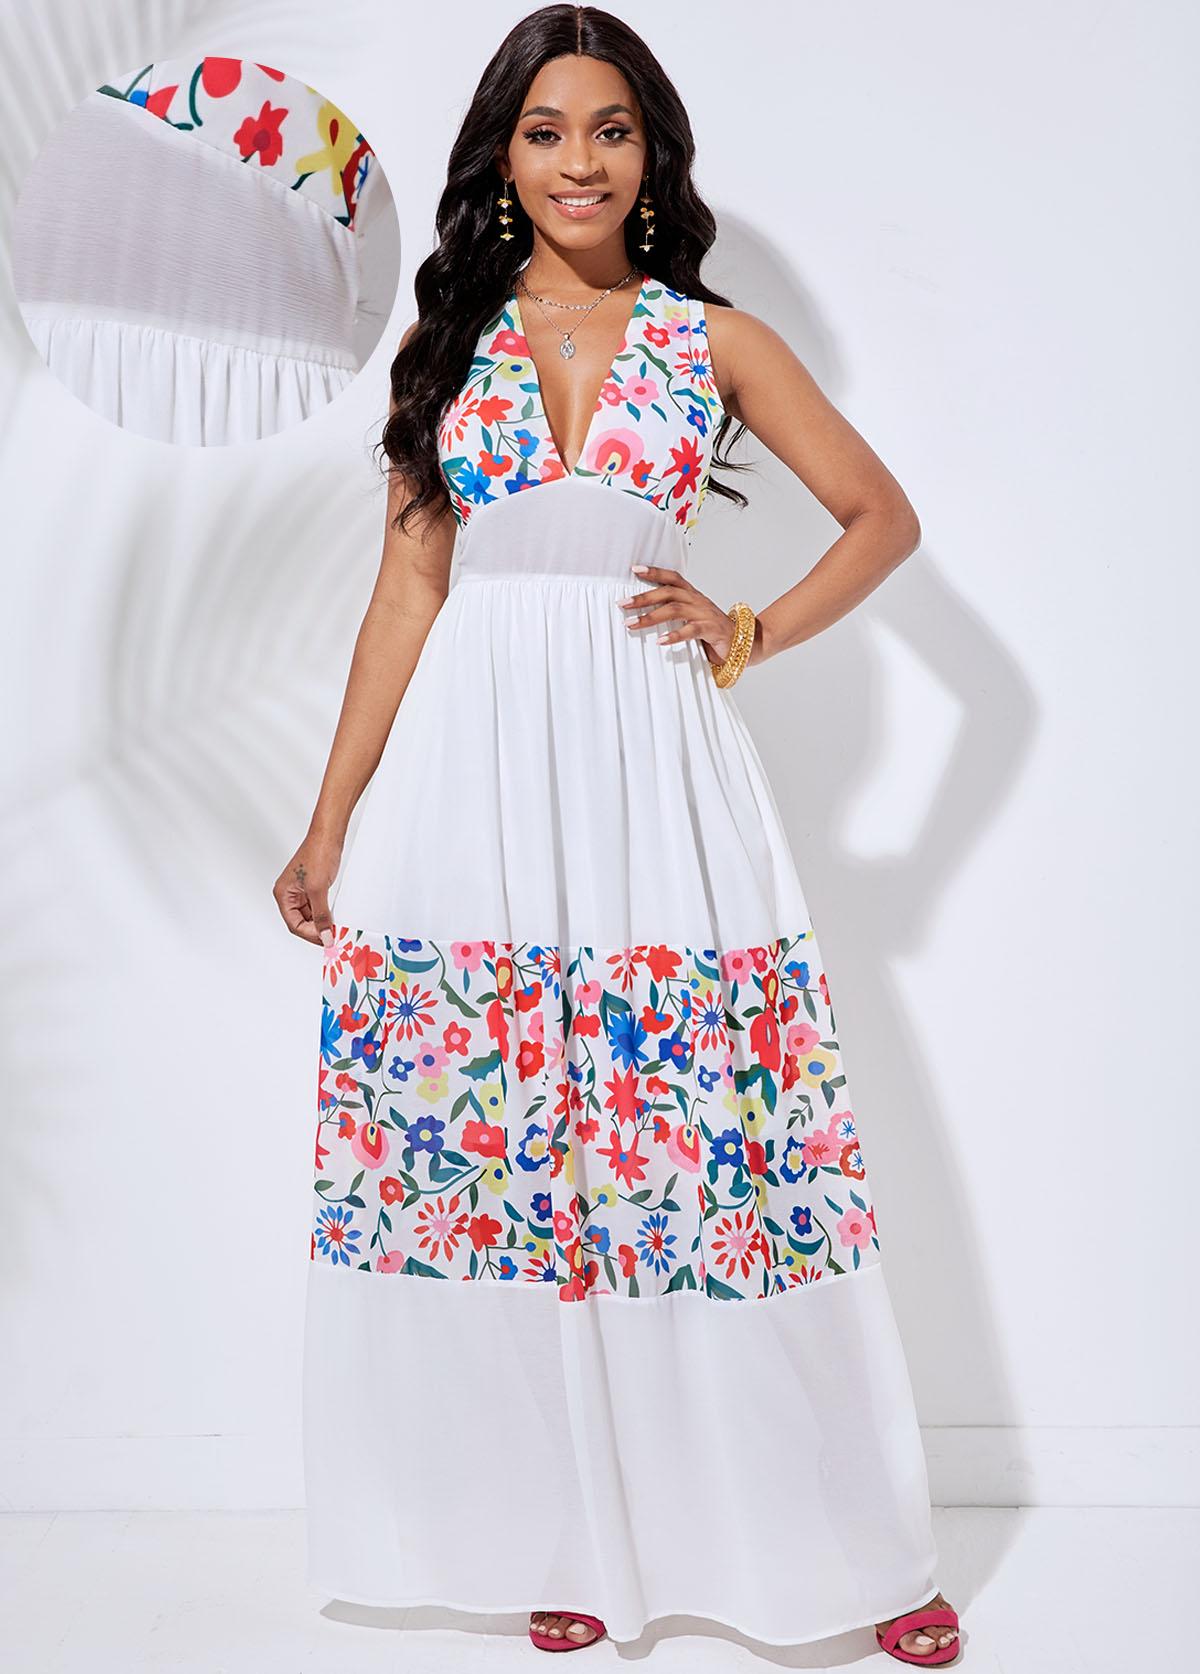 V Neck Floral Print Cutout Back Dress